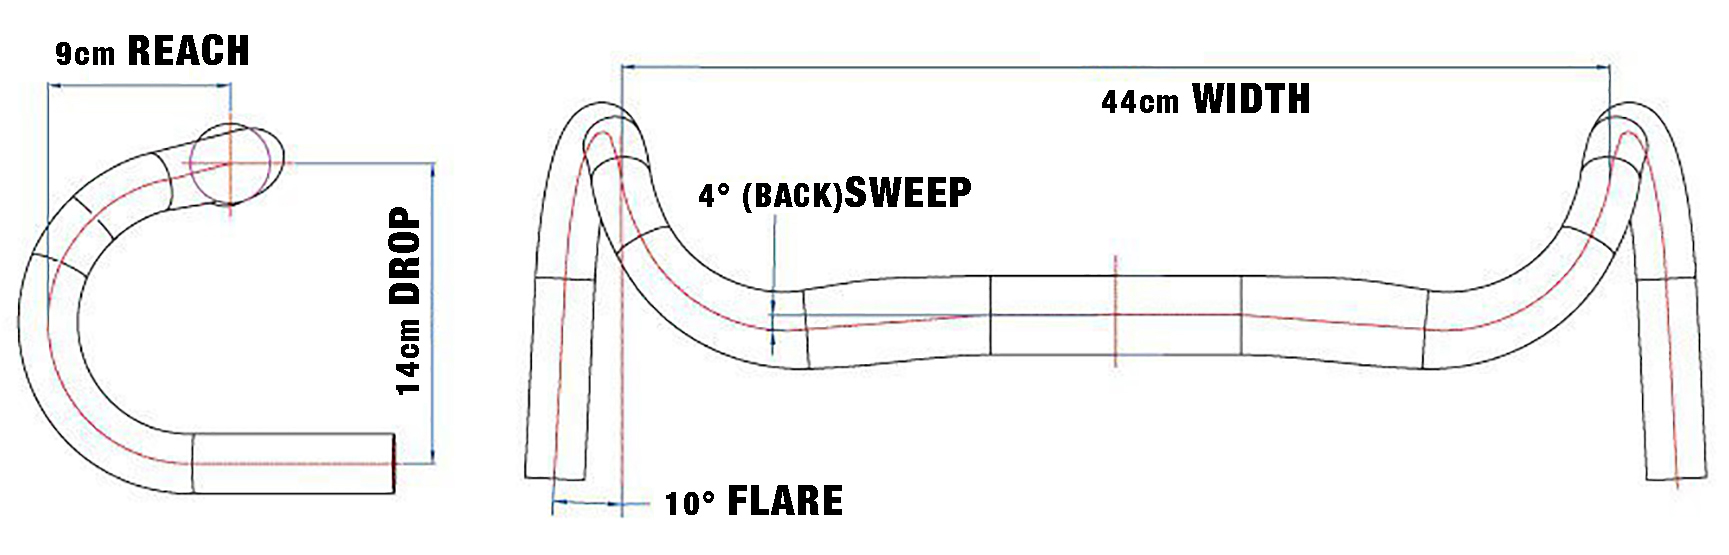 sweep_drop_reach_flare.jpg